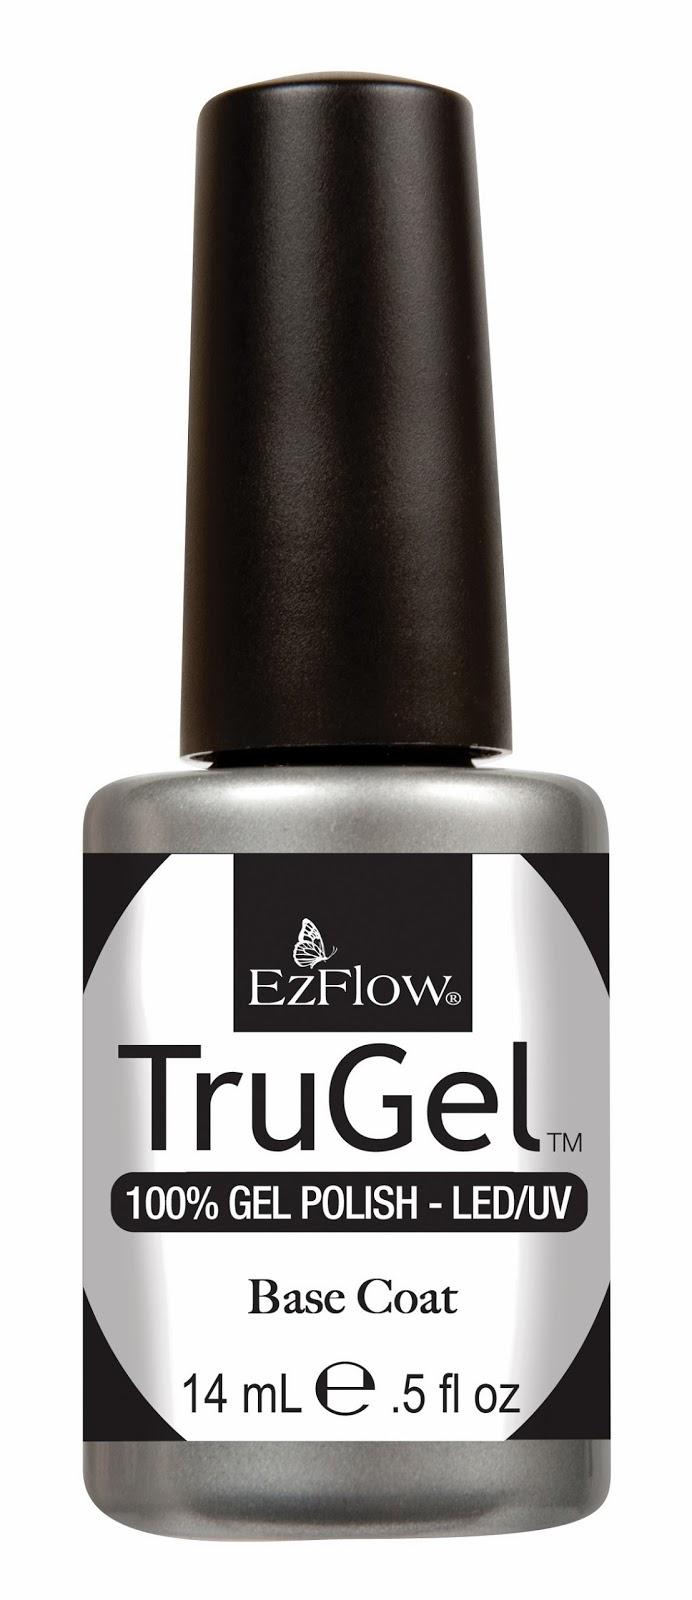 EZ Flow TruGel Nail Polish Launch – Ingrid Nieto